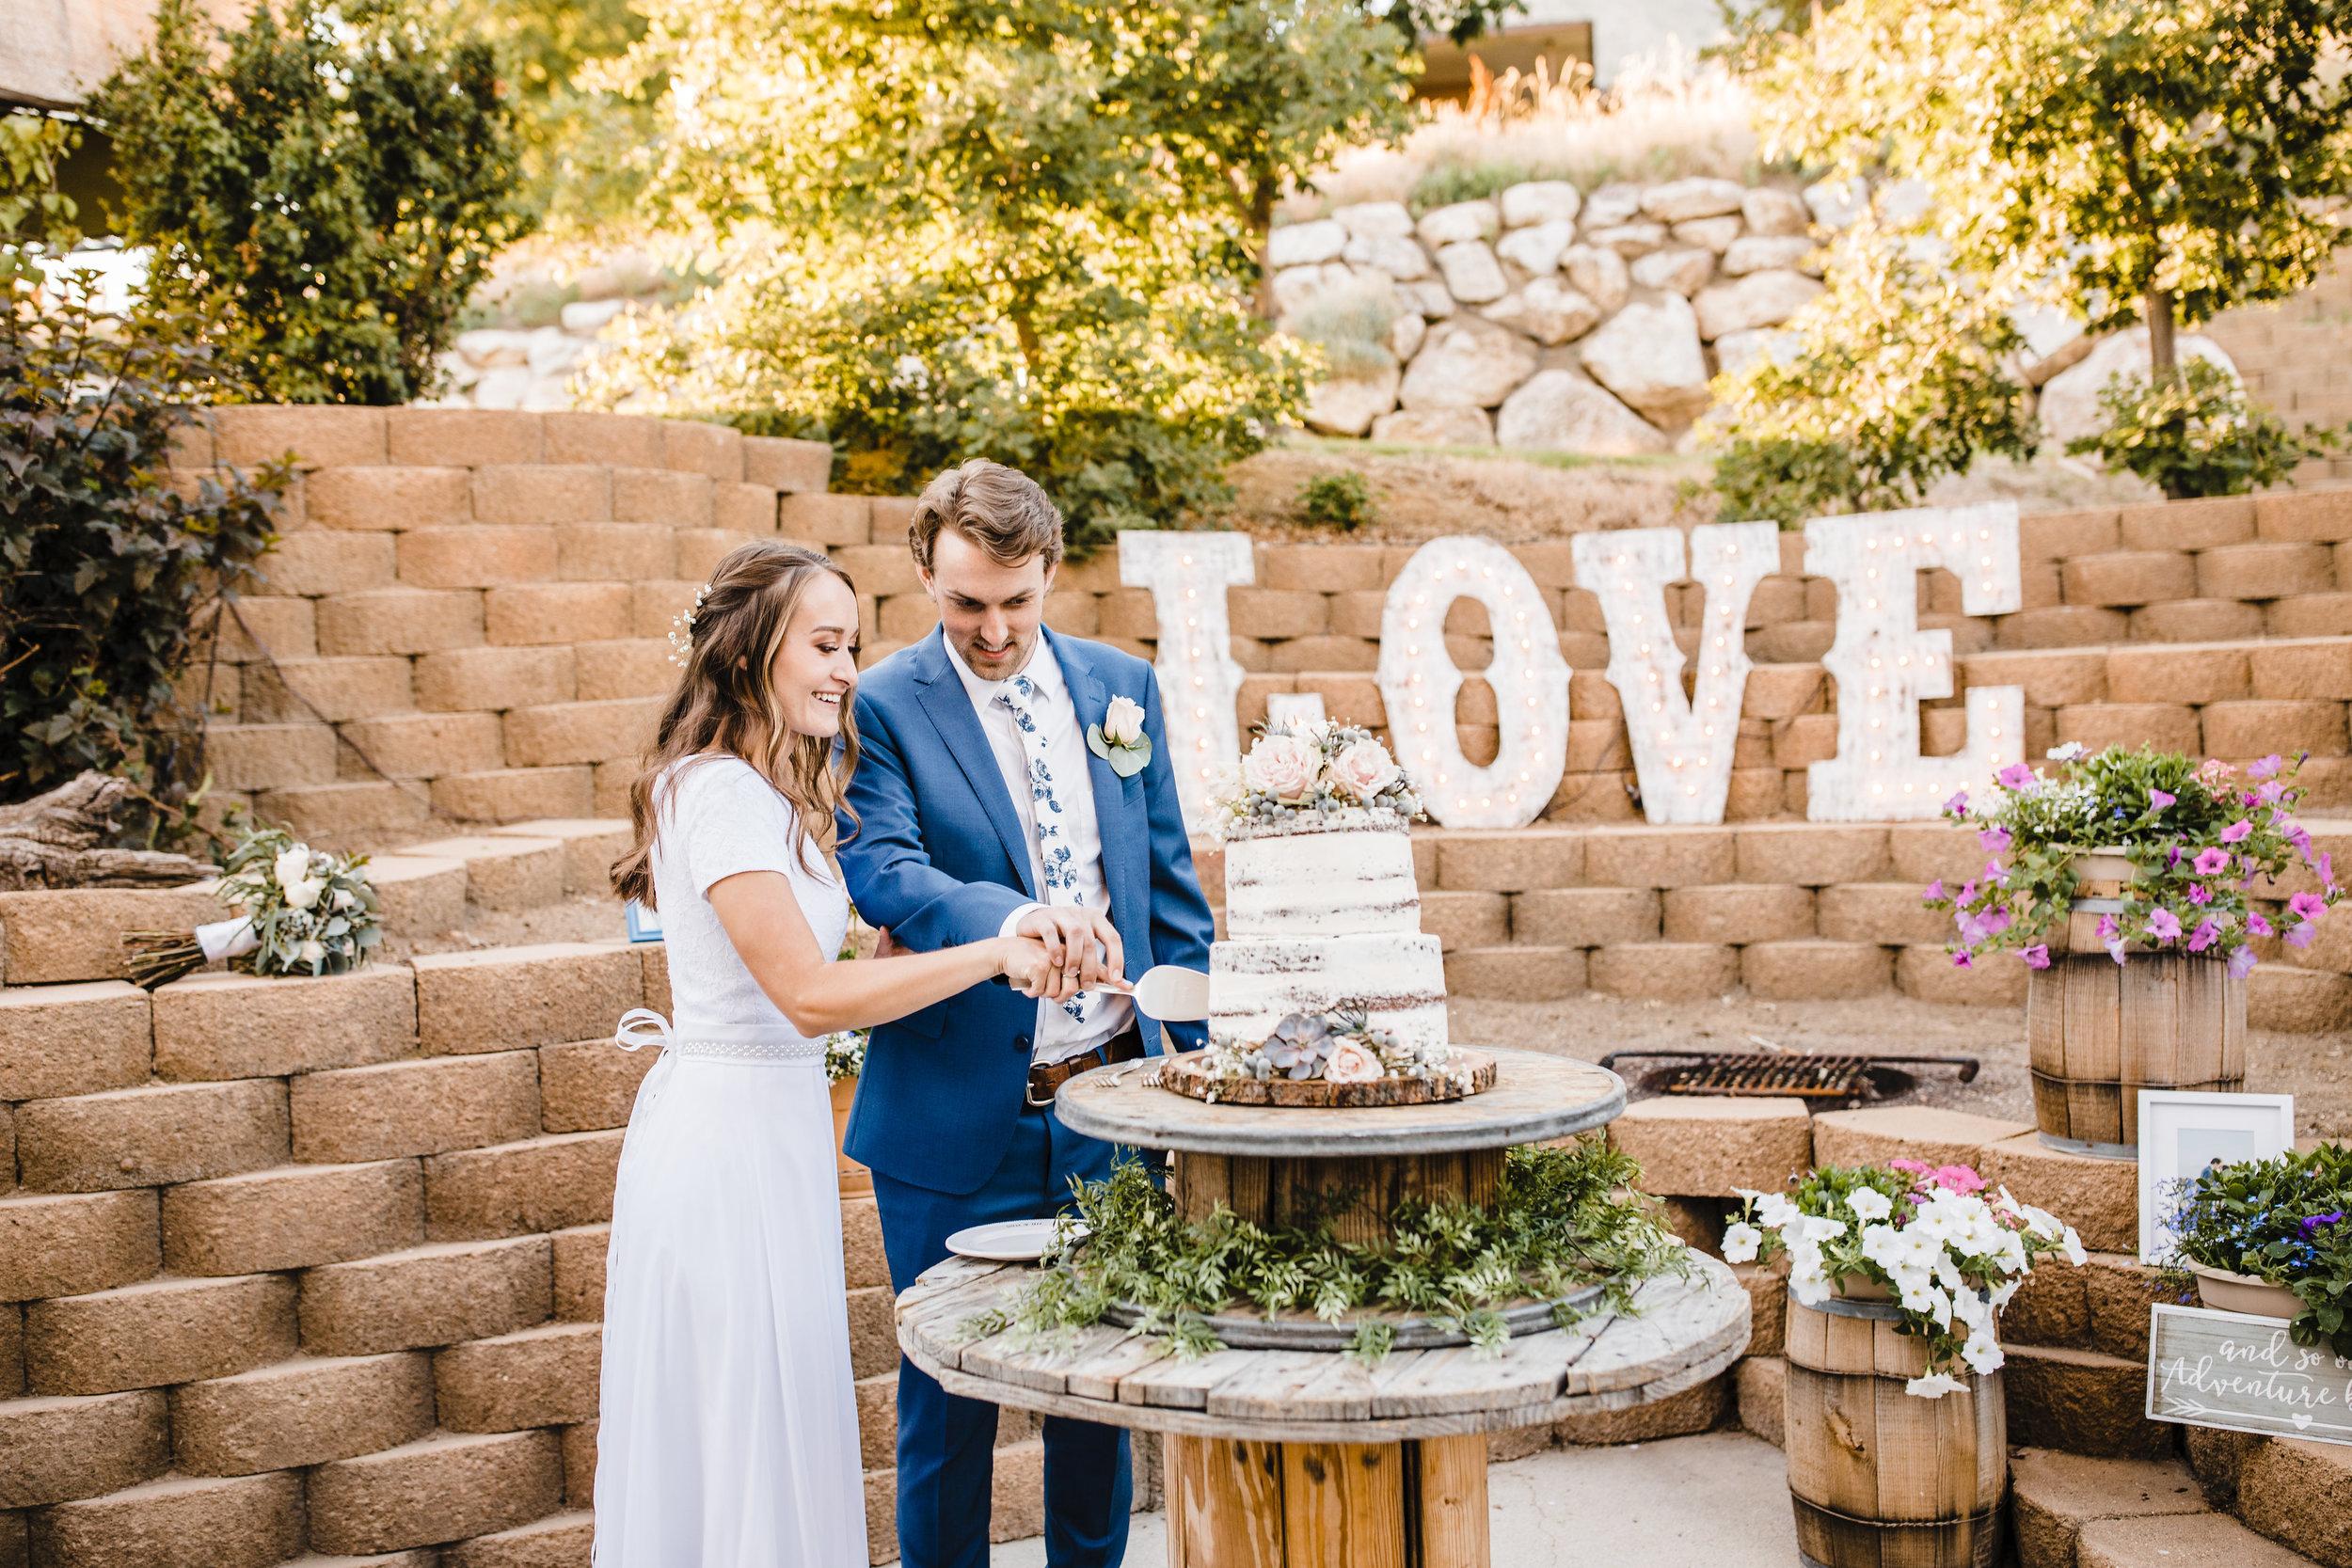 logan utah wedding photographer outdoor reception cake cutting love sign